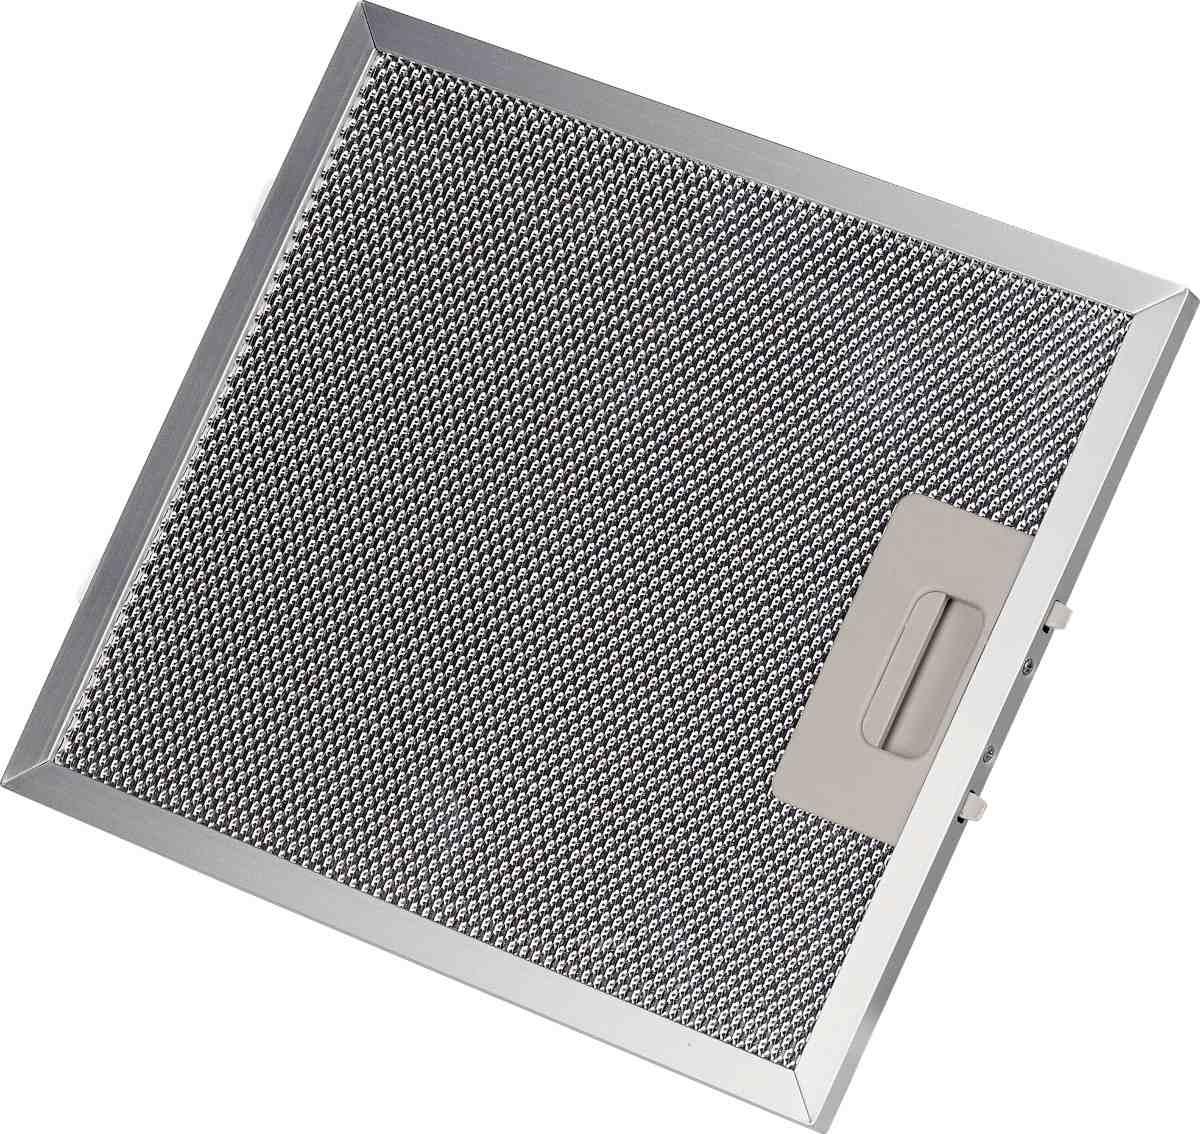 Filtro Alumínio Coifa Topazio 70cm Suggar 40 x 33 cm  - HL SERVICE